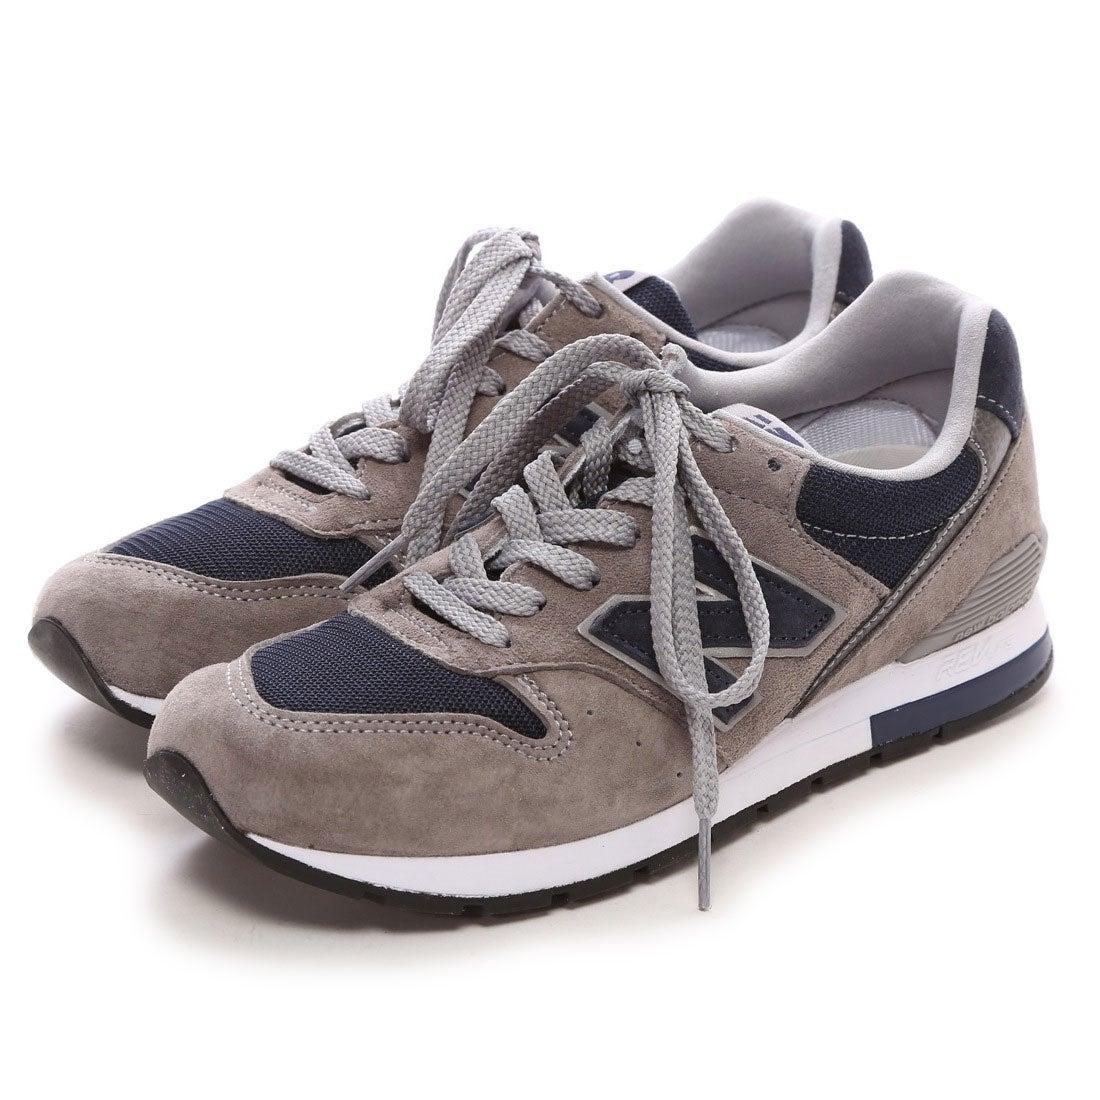 29201a63ebd7e ニューバランス new balance NB MRL996 BP(ピューター) -靴&ファッション通販 ロコンド〜自宅で試着、気軽に返品